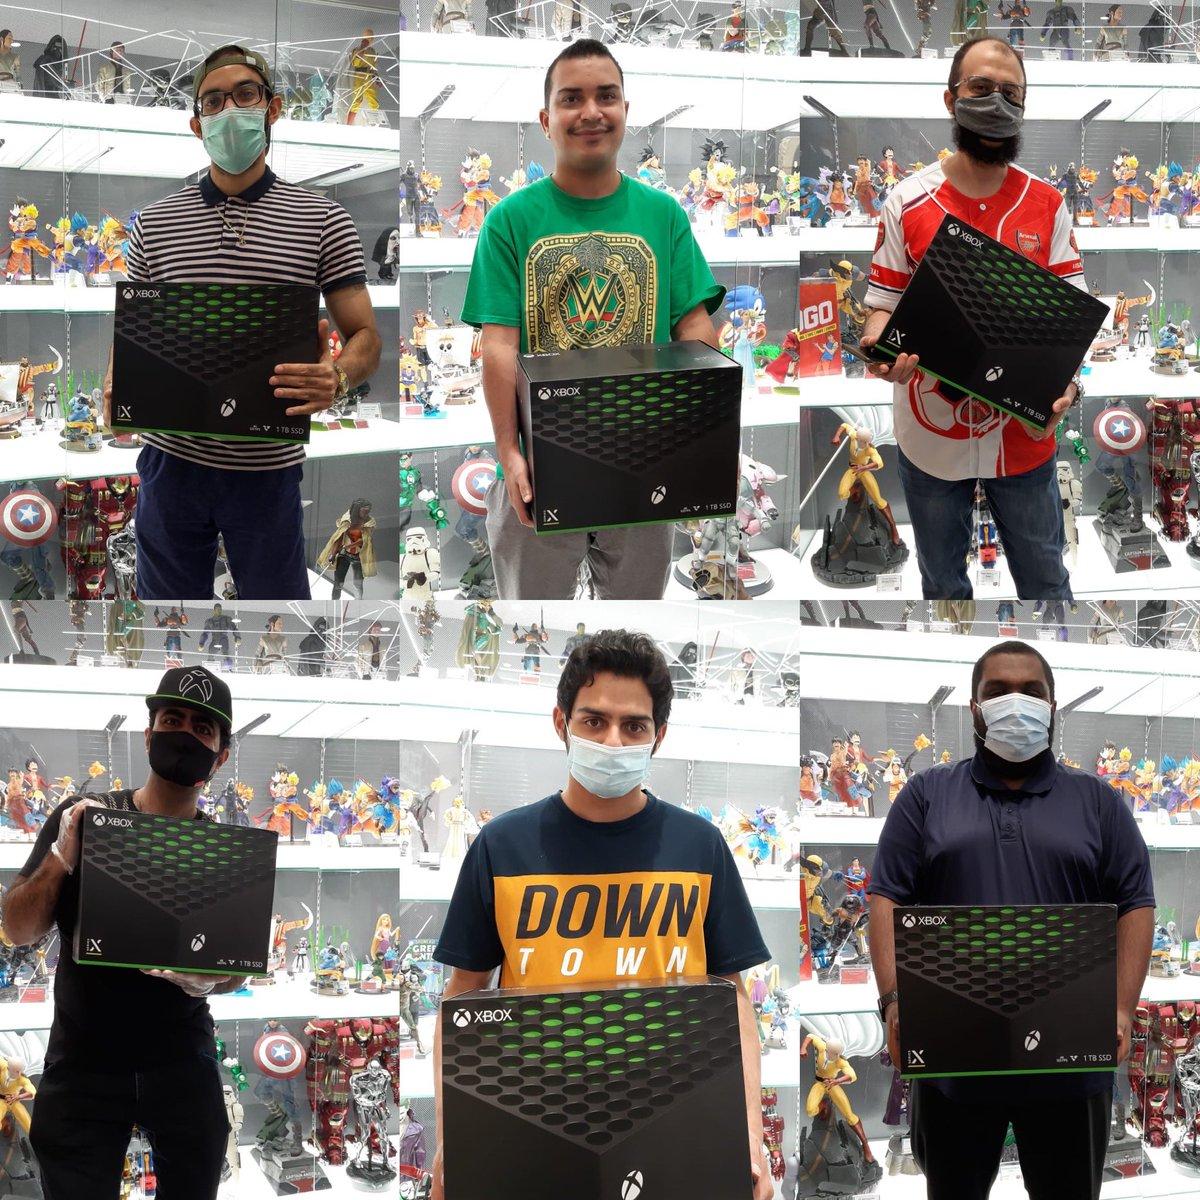 Bahraini Fans #XboxSeriesX #XboxSeriesS @XboxGulf @GDNonline https://t.co/yi6X2C7B8L